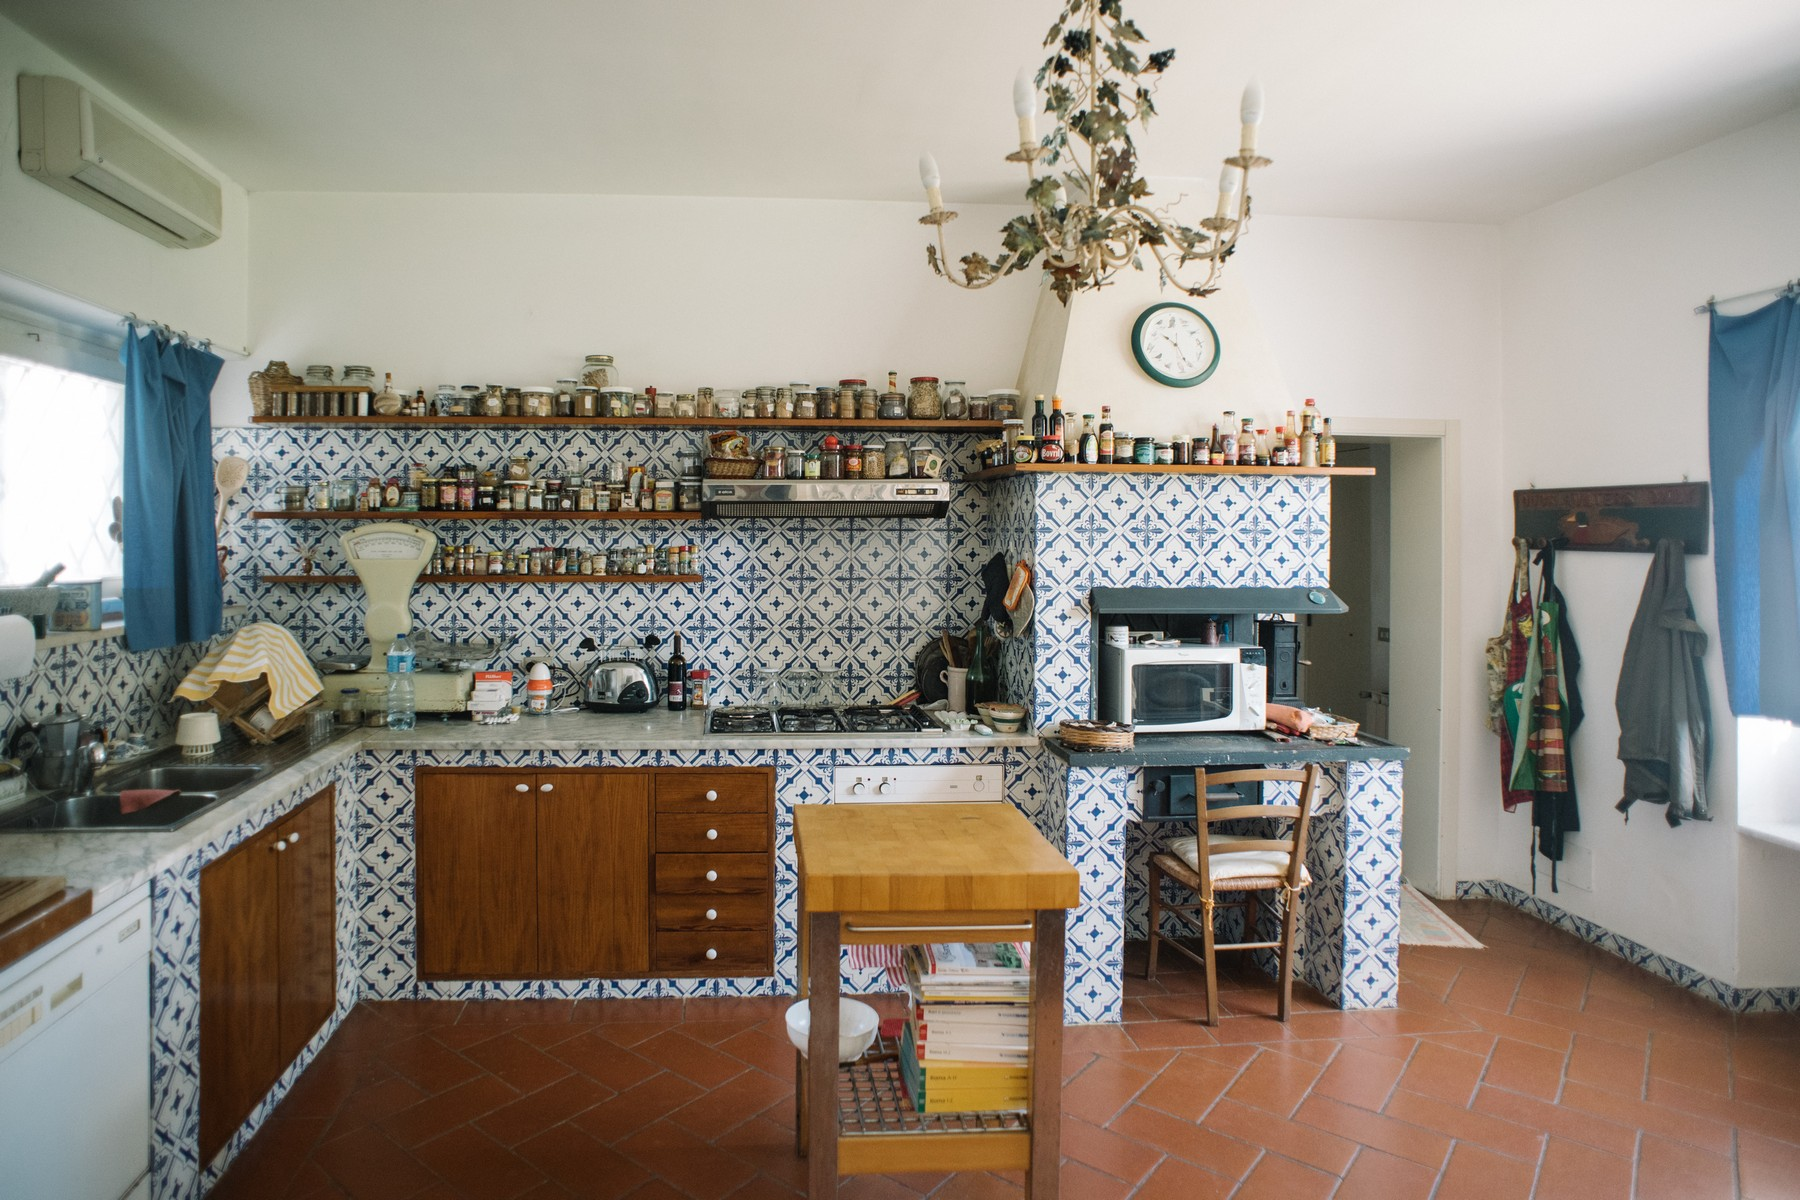 Rustico in Vendita a Castellaneta: 5 locali, 660 mq - Foto 9